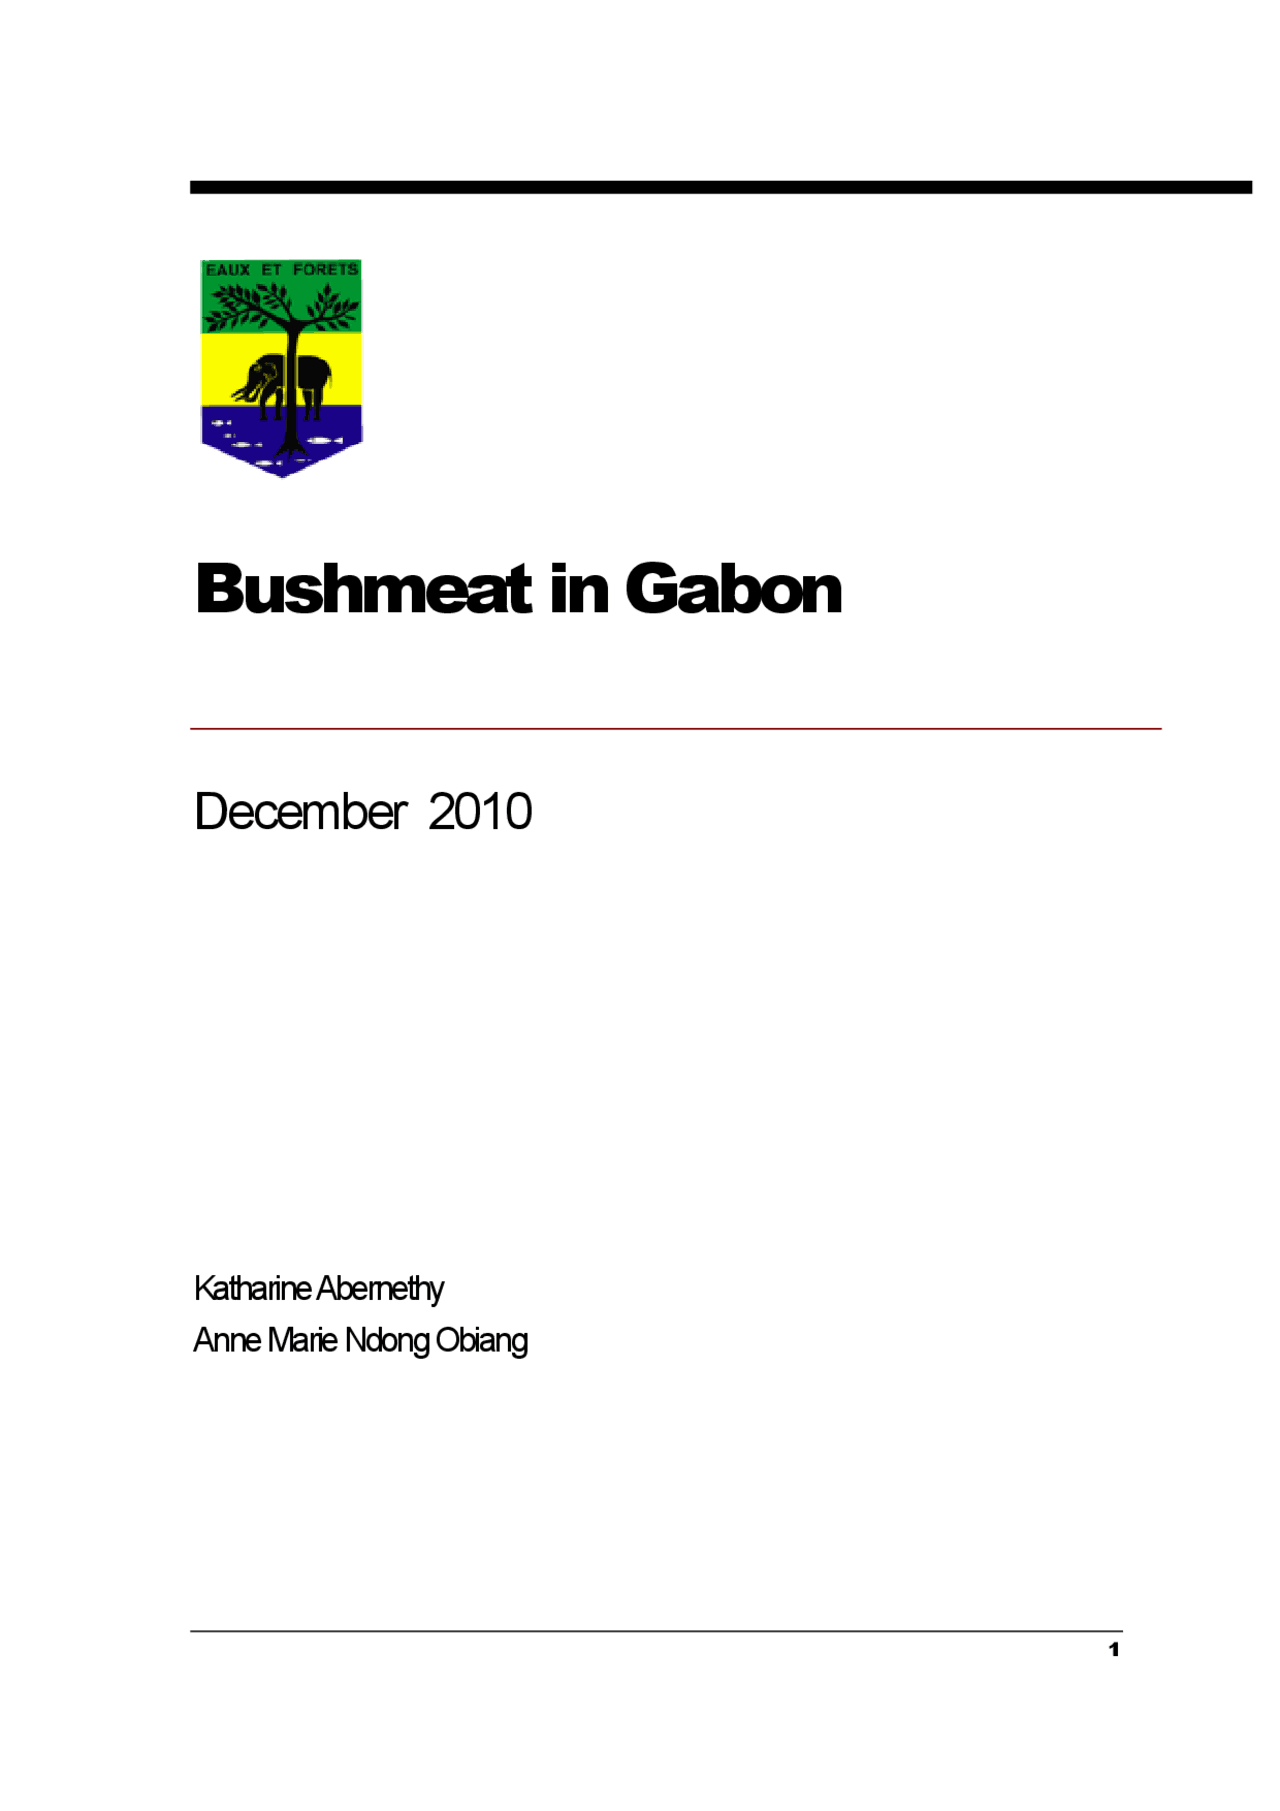 Site ul de dating cre tin in Gabon)